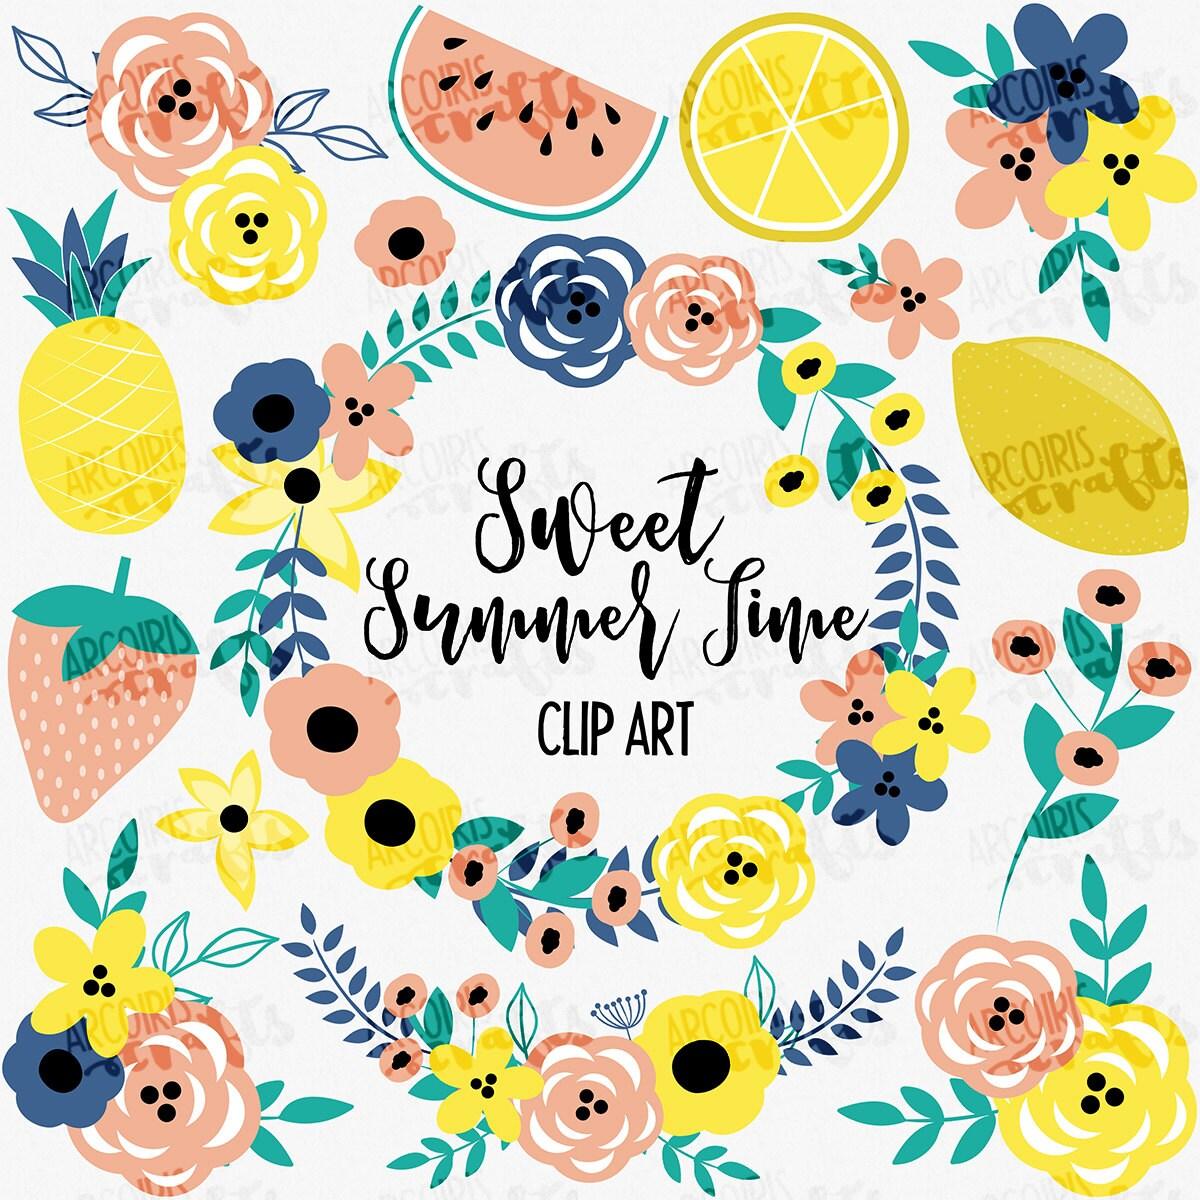 summer clipart etsy - photo #44